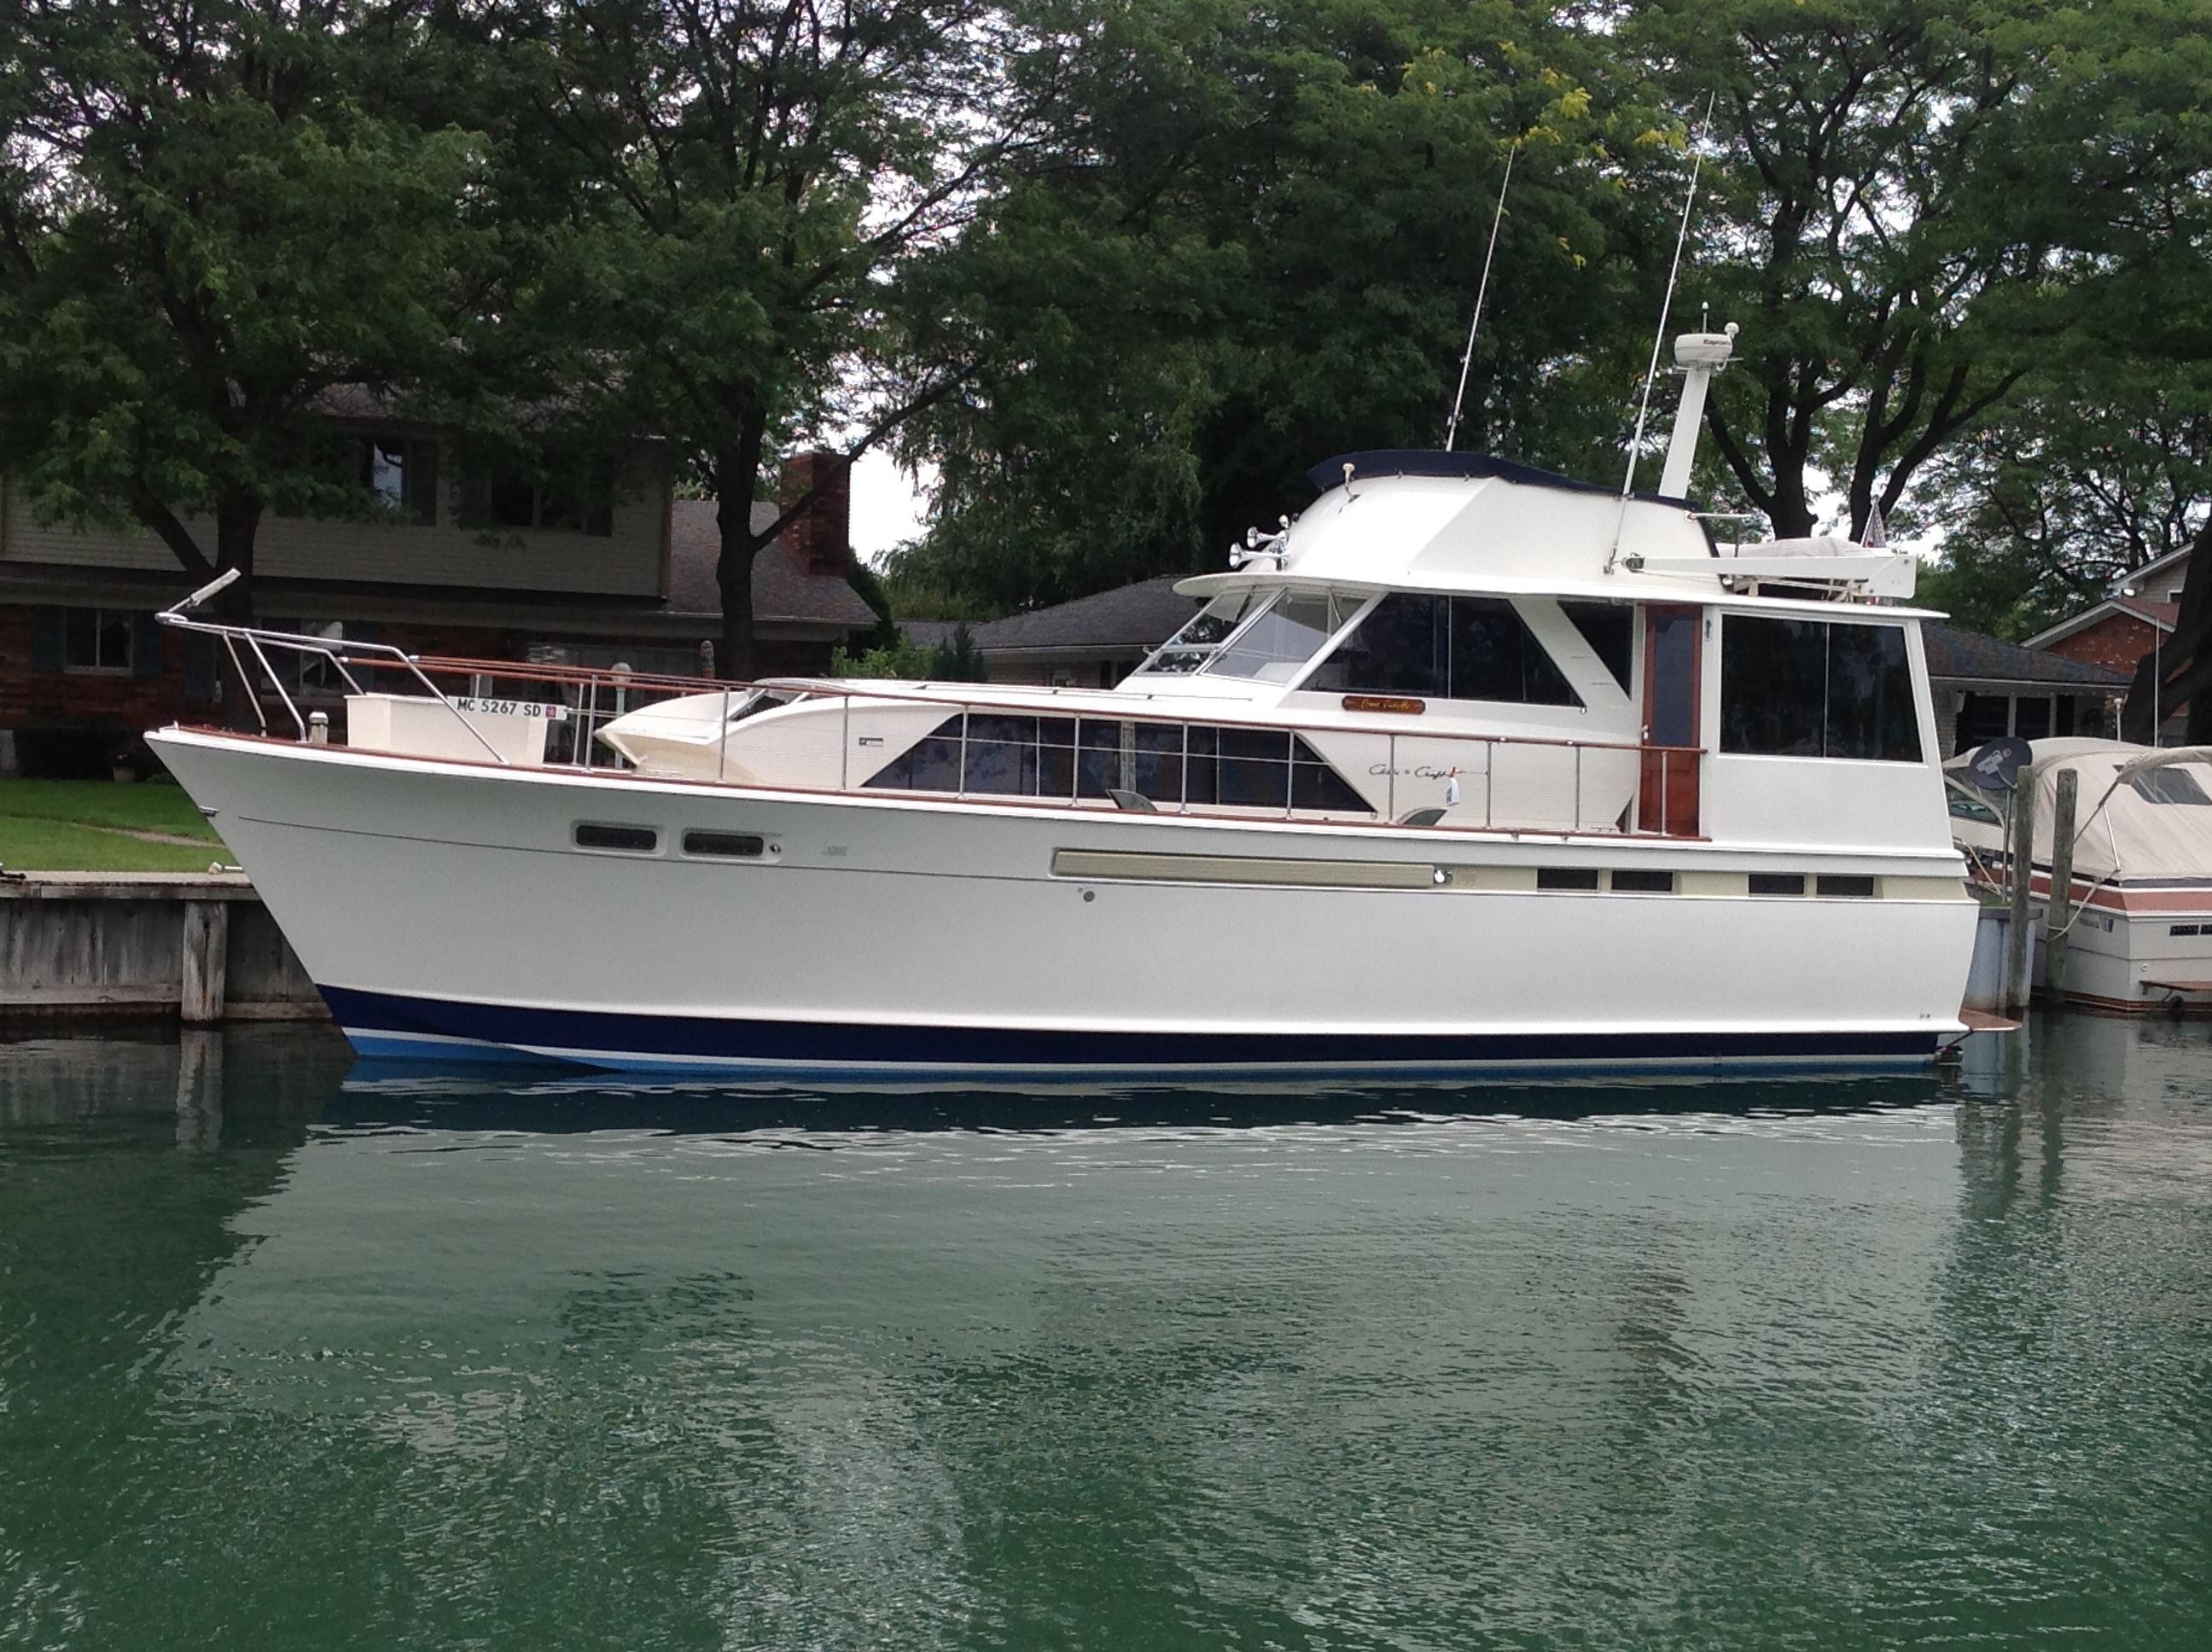 1968 Chris Craft Commander Flush Deck Power Boat For Sale